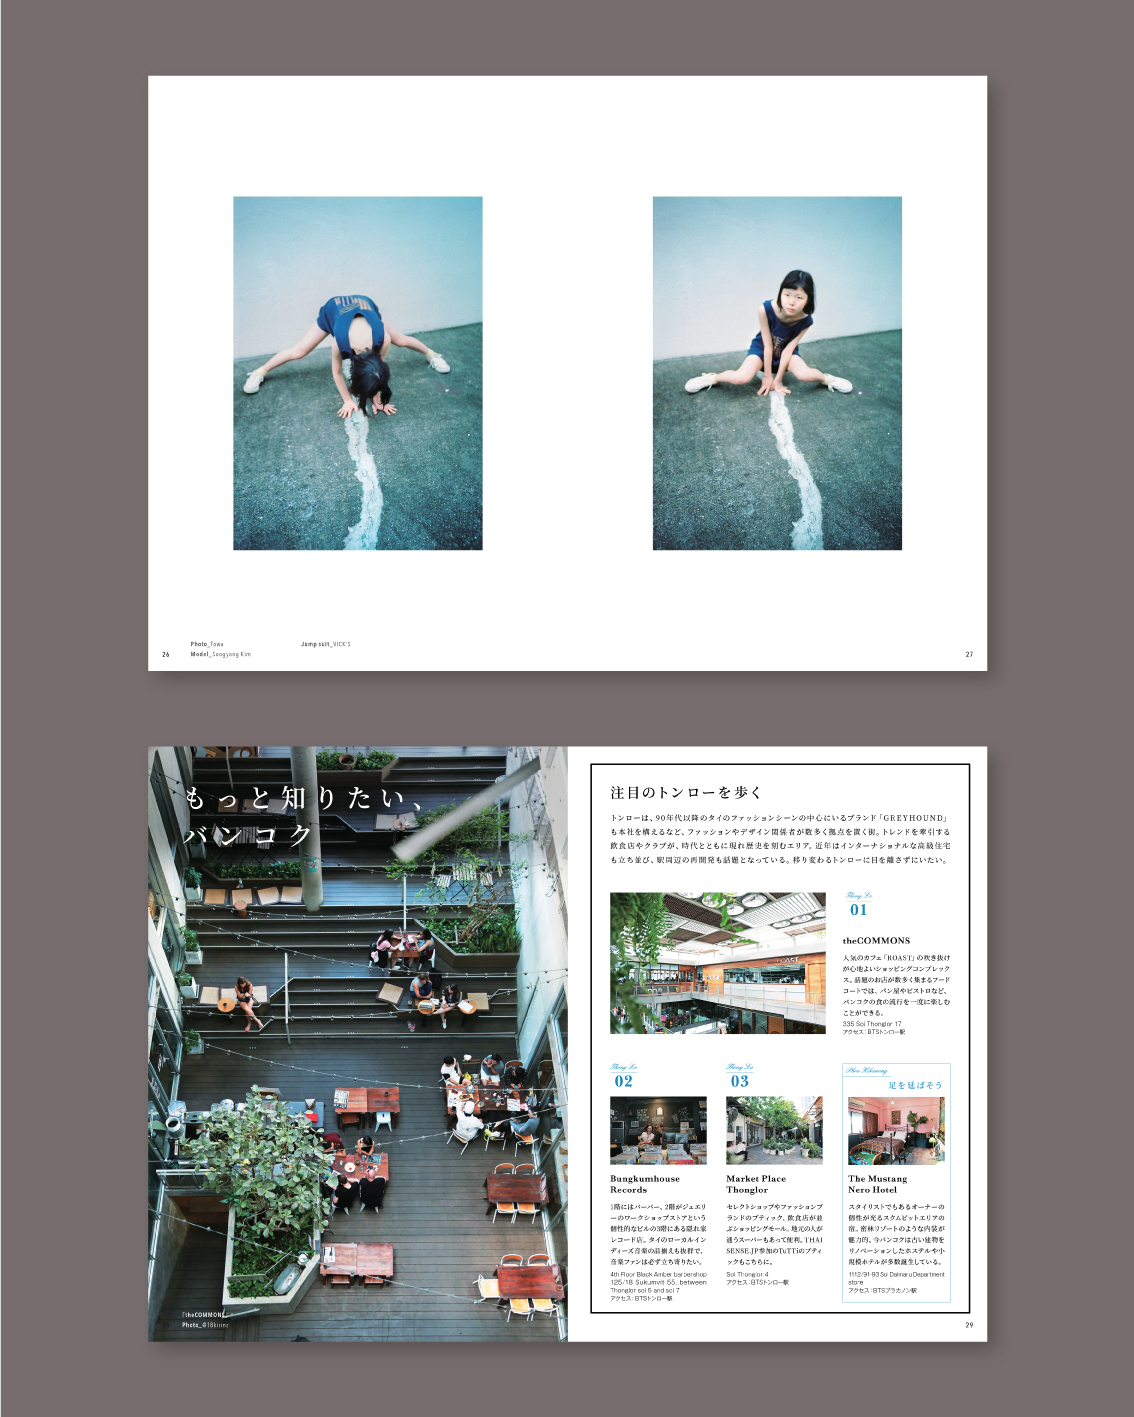 Thai_sense_03